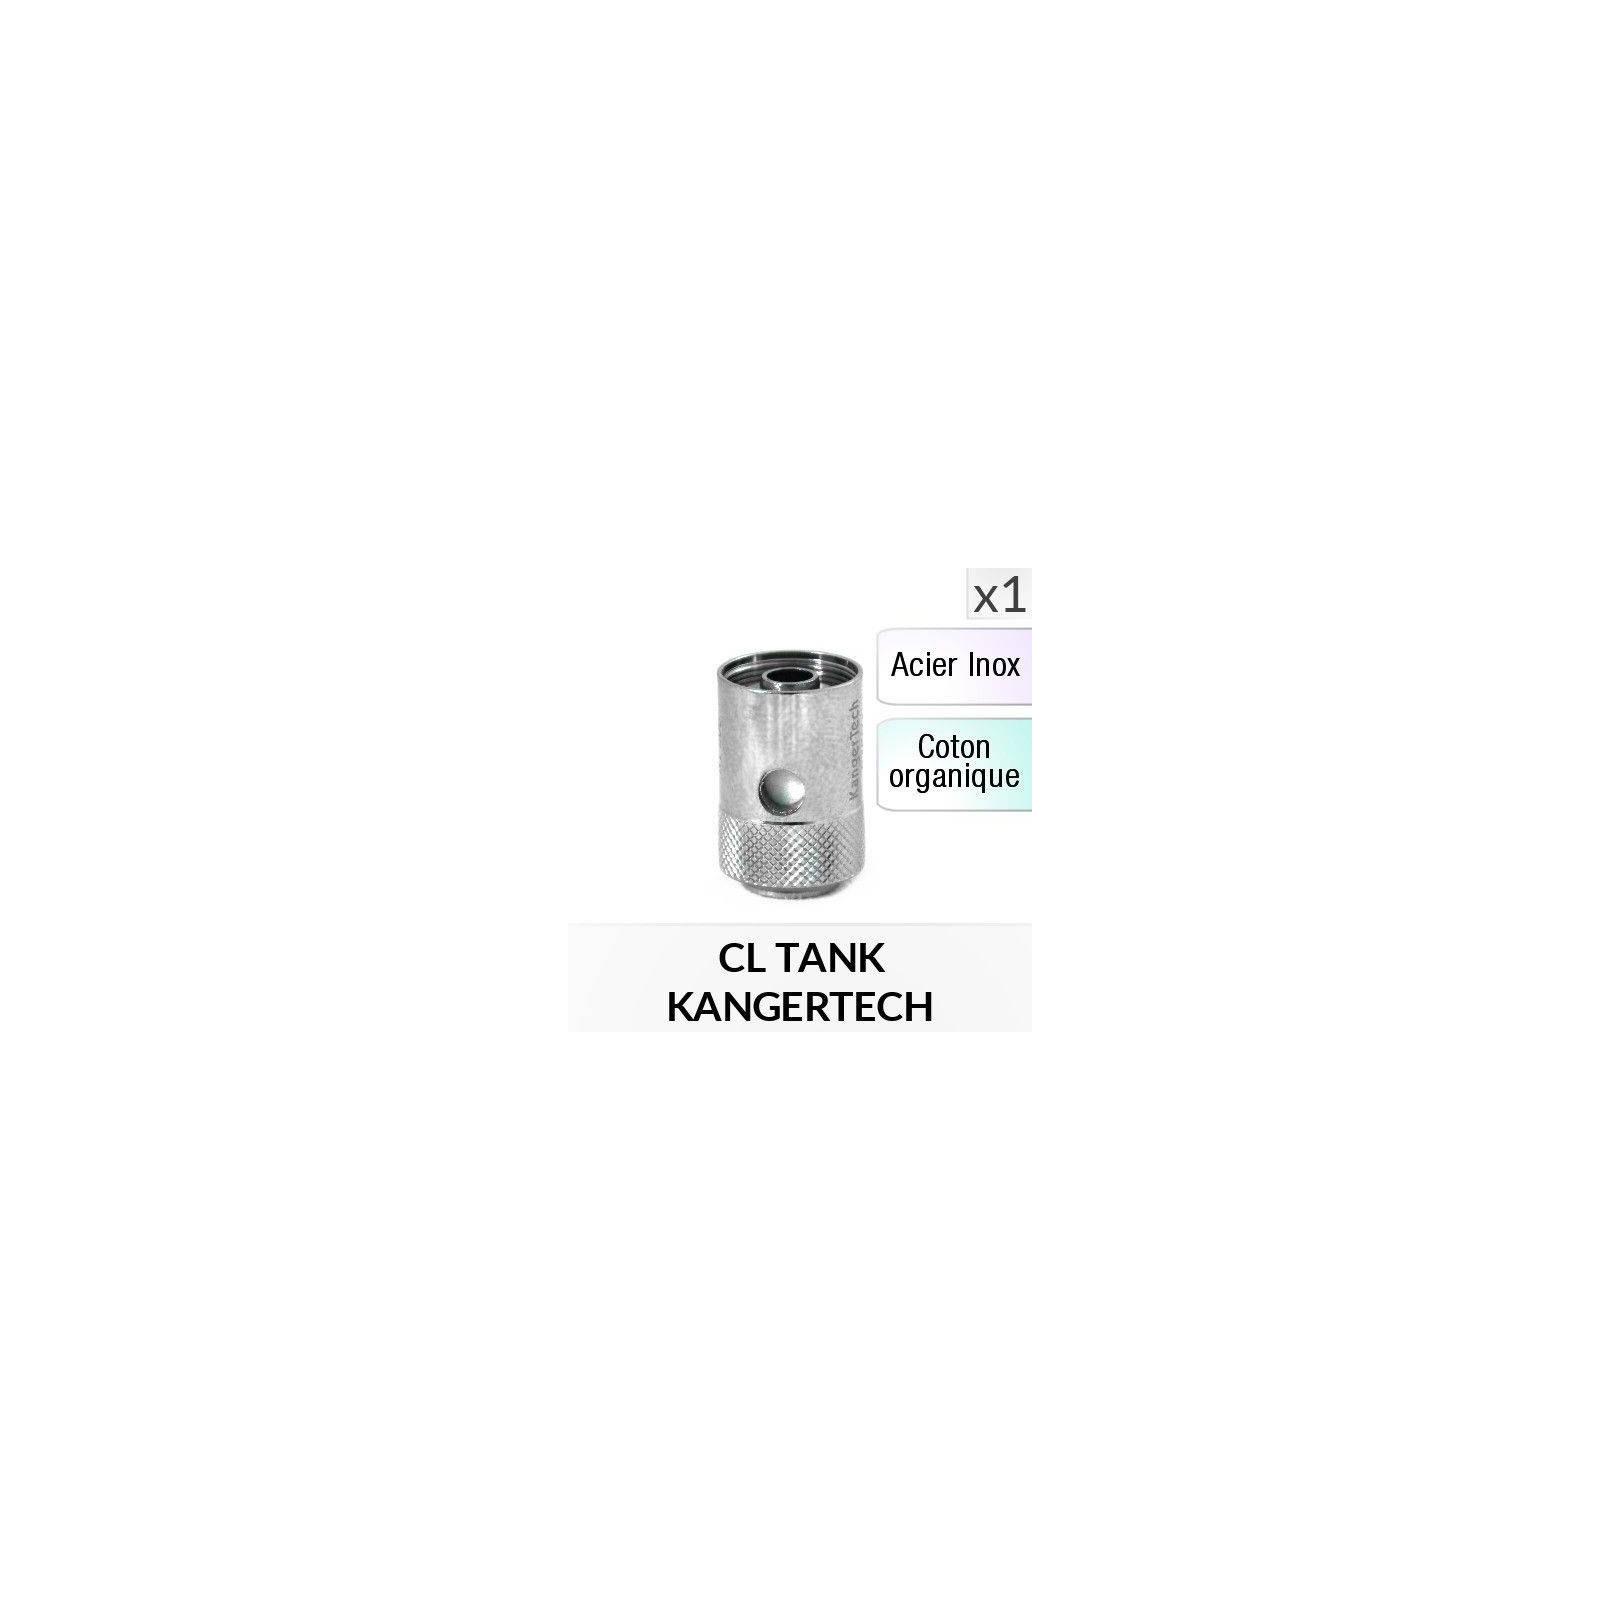 Résistance CLOCC Inox - 1 Pièce - KANGERTECH